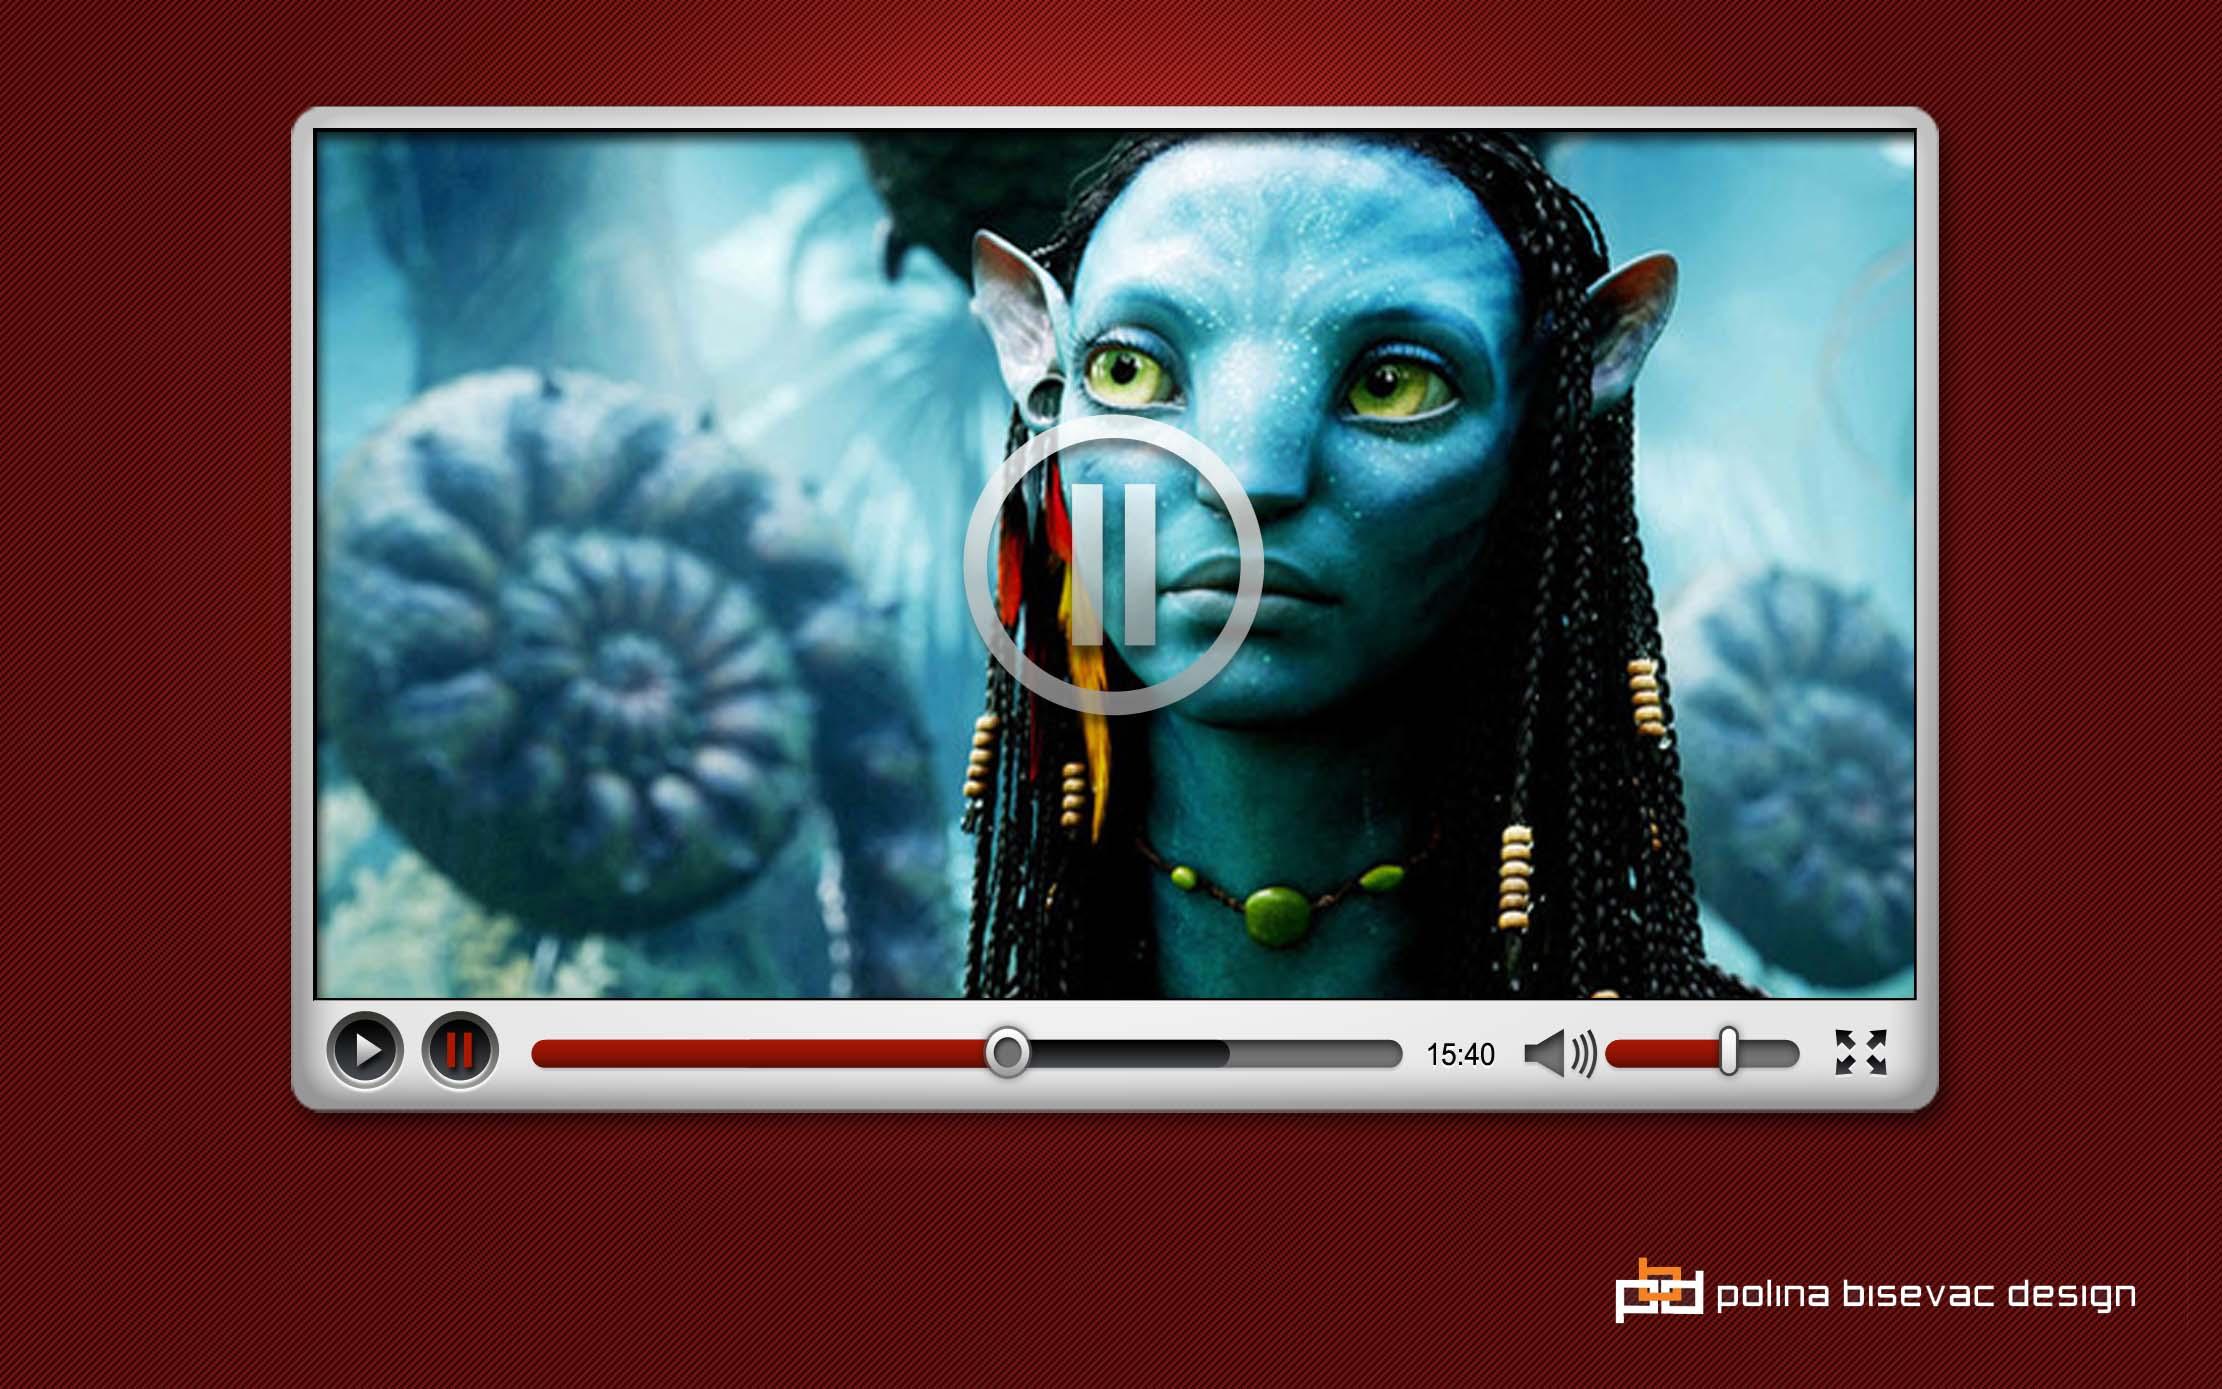 videoplayer_ui_design_pb